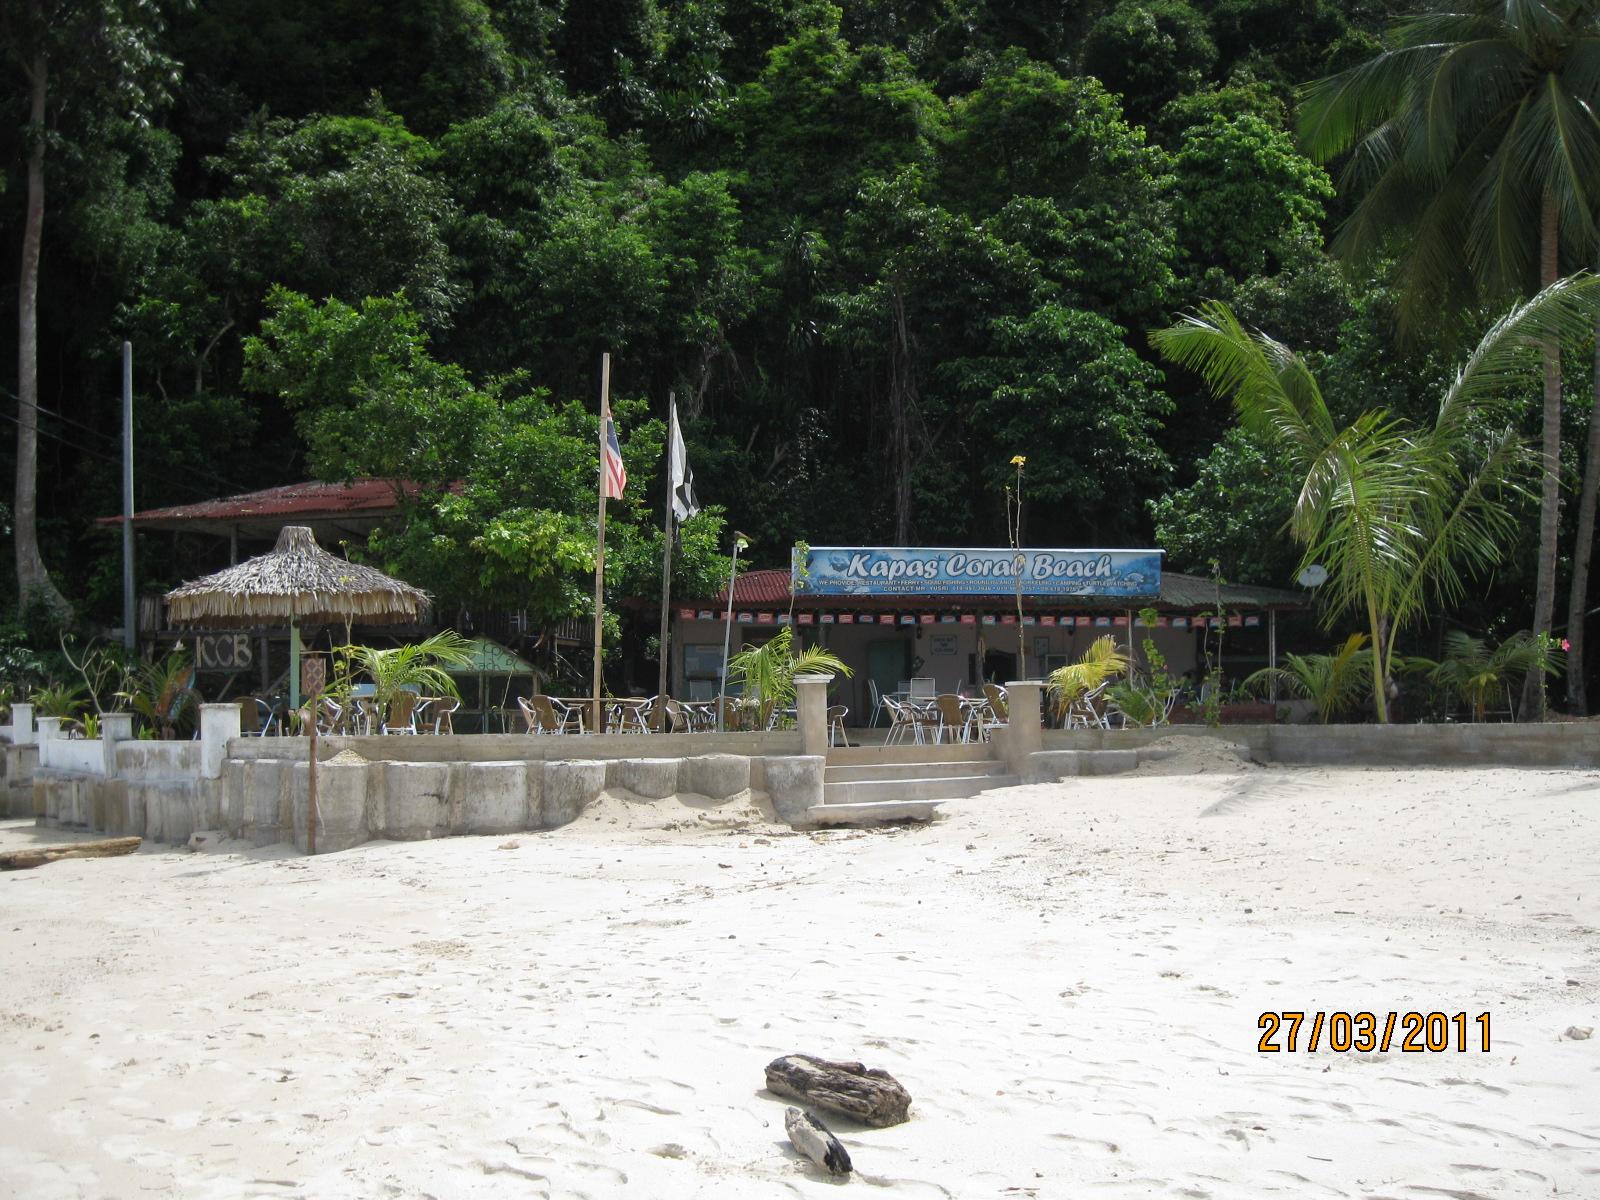 how to get to pulau kapas from kuala lumpur